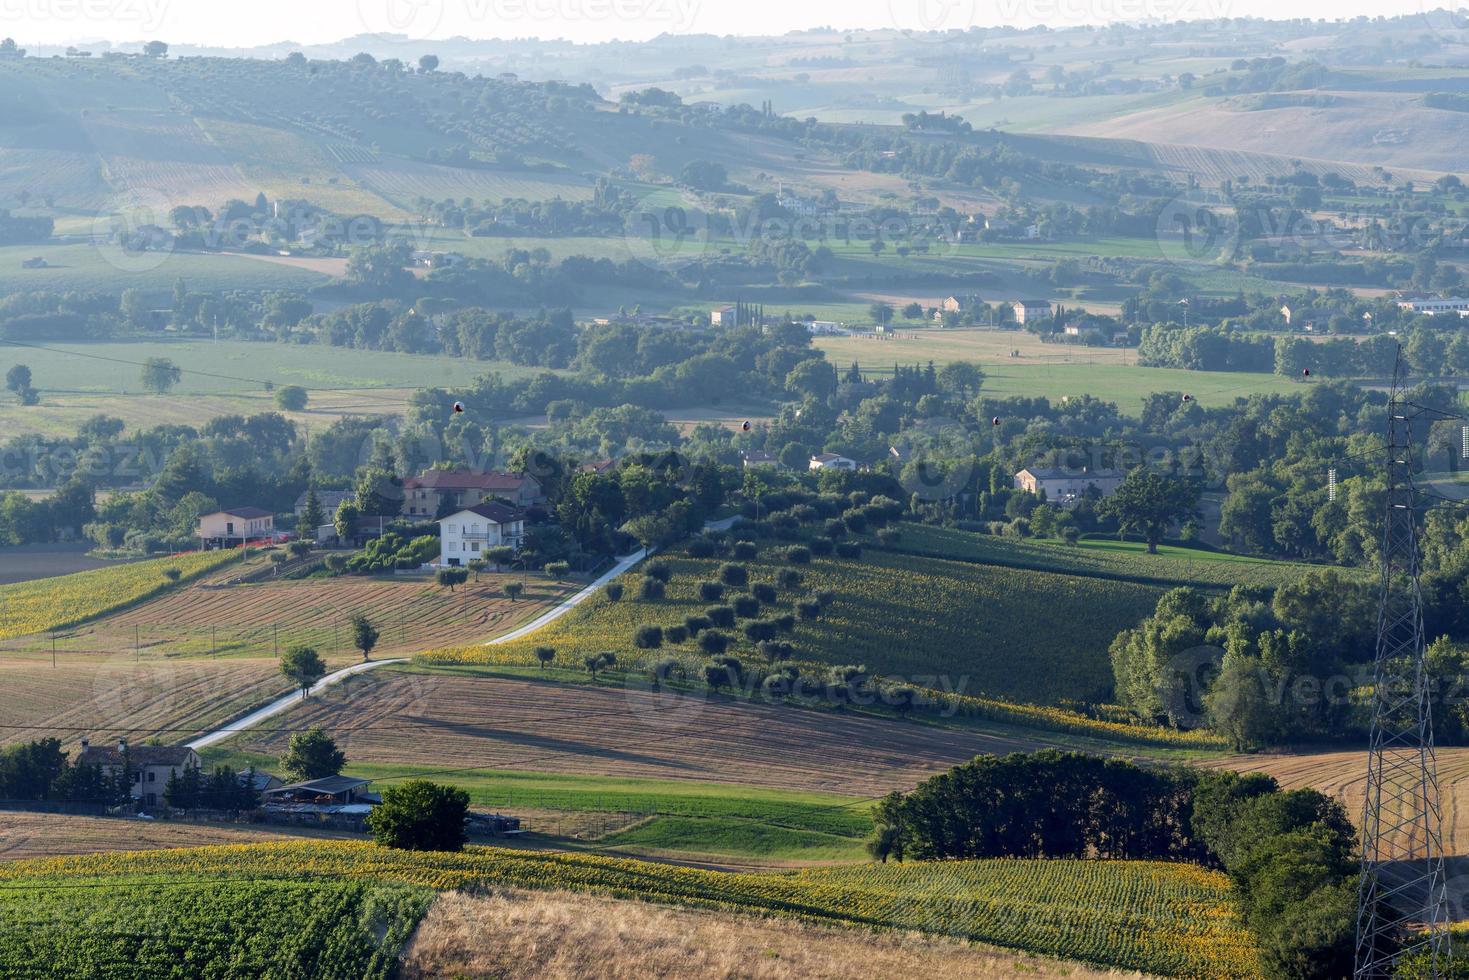 sommarlandskap i marscher (Italien) foto